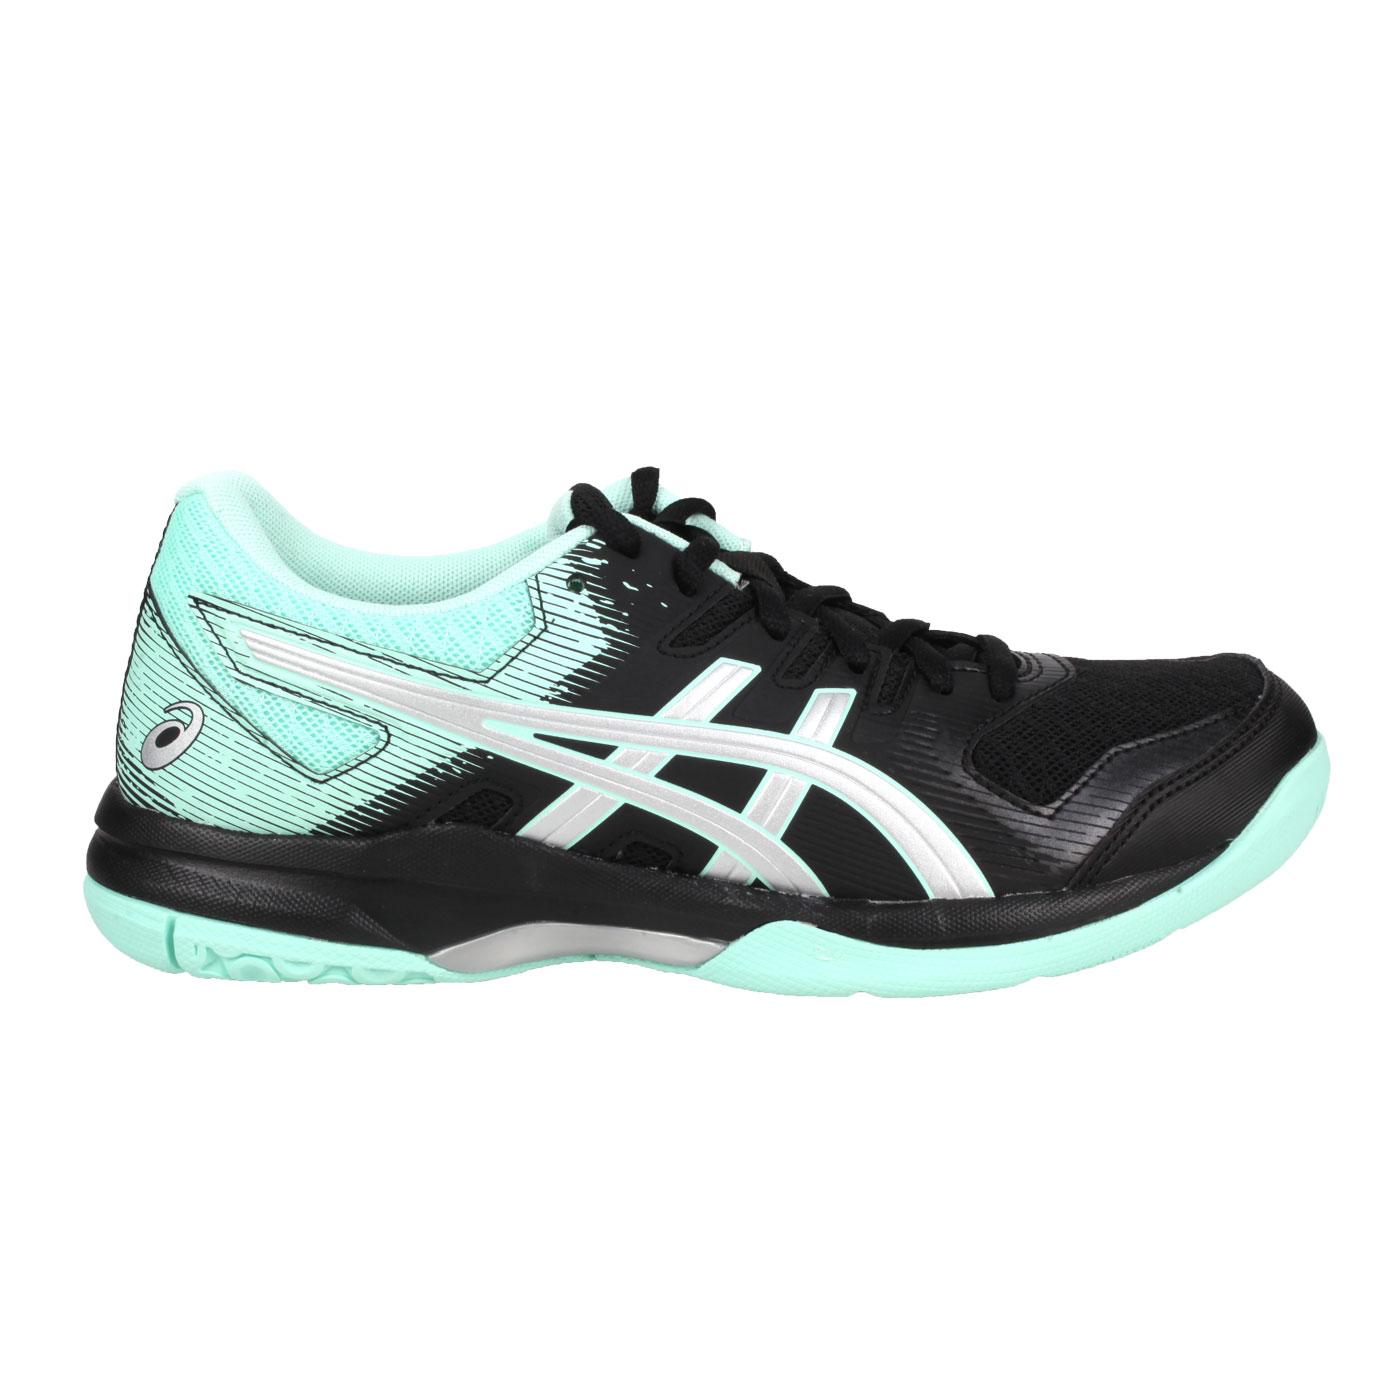 ASICS 女款排羽球鞋  @GEL-ROCKET 9@1072A034-003 - 黑粉綠銀